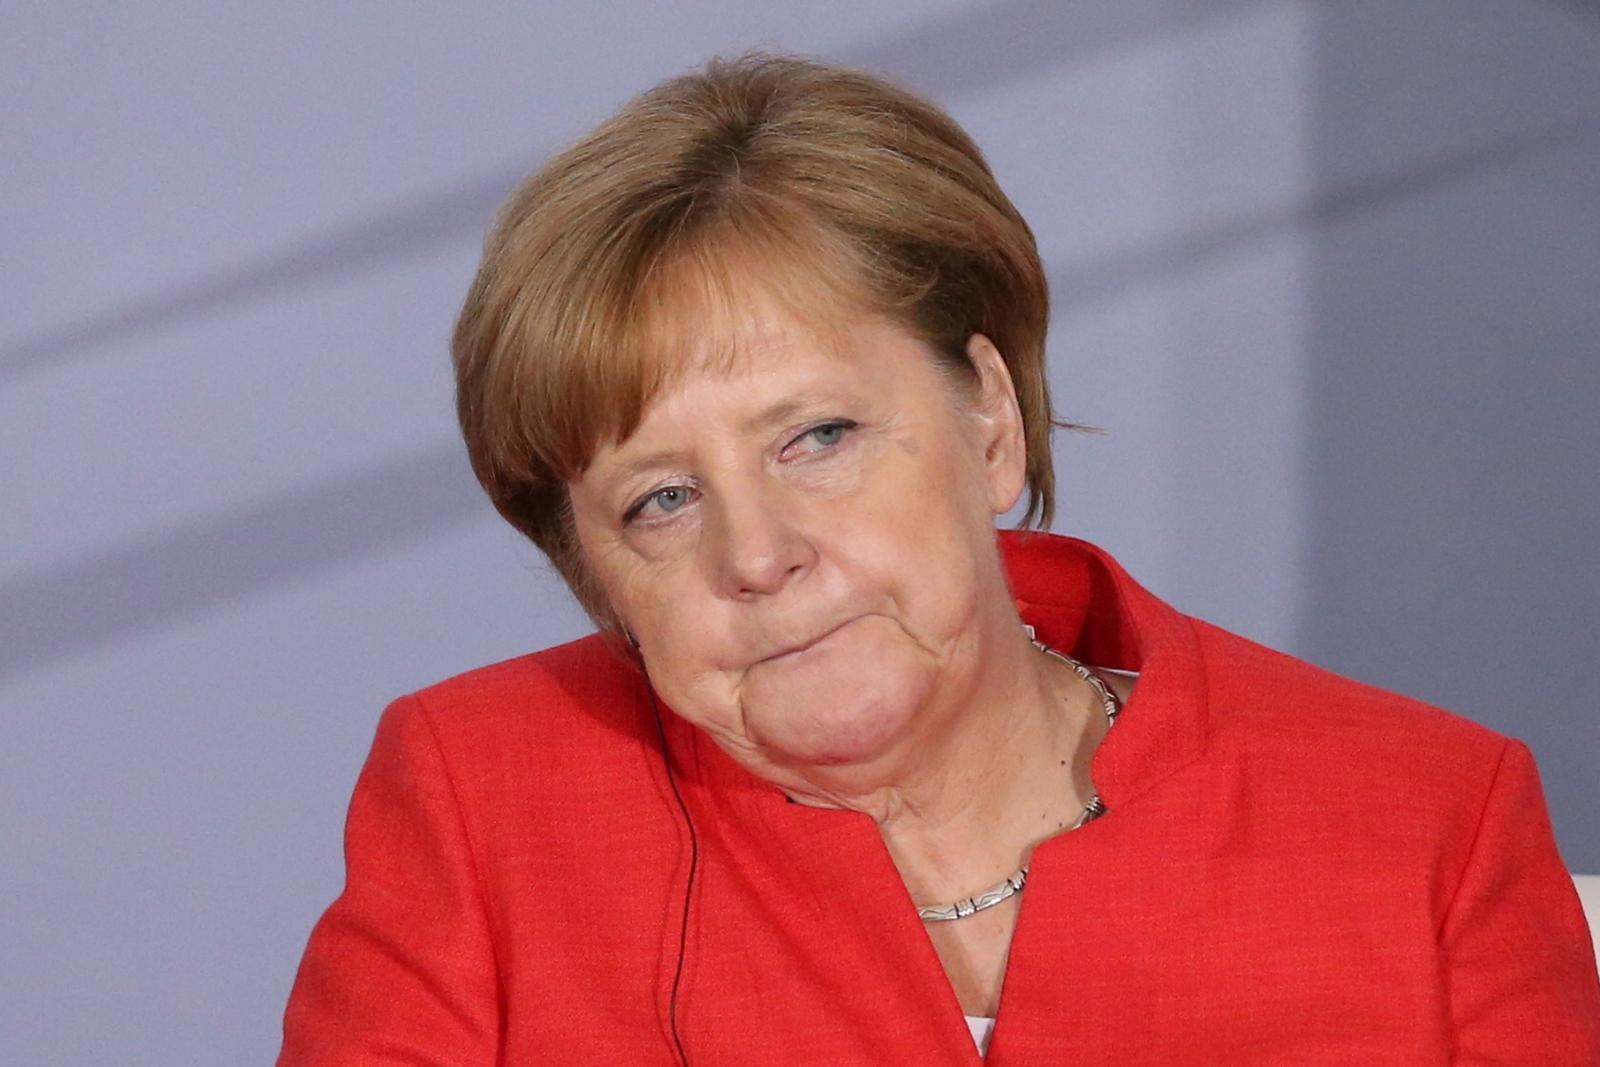 Angela Merkel on Mexico wall